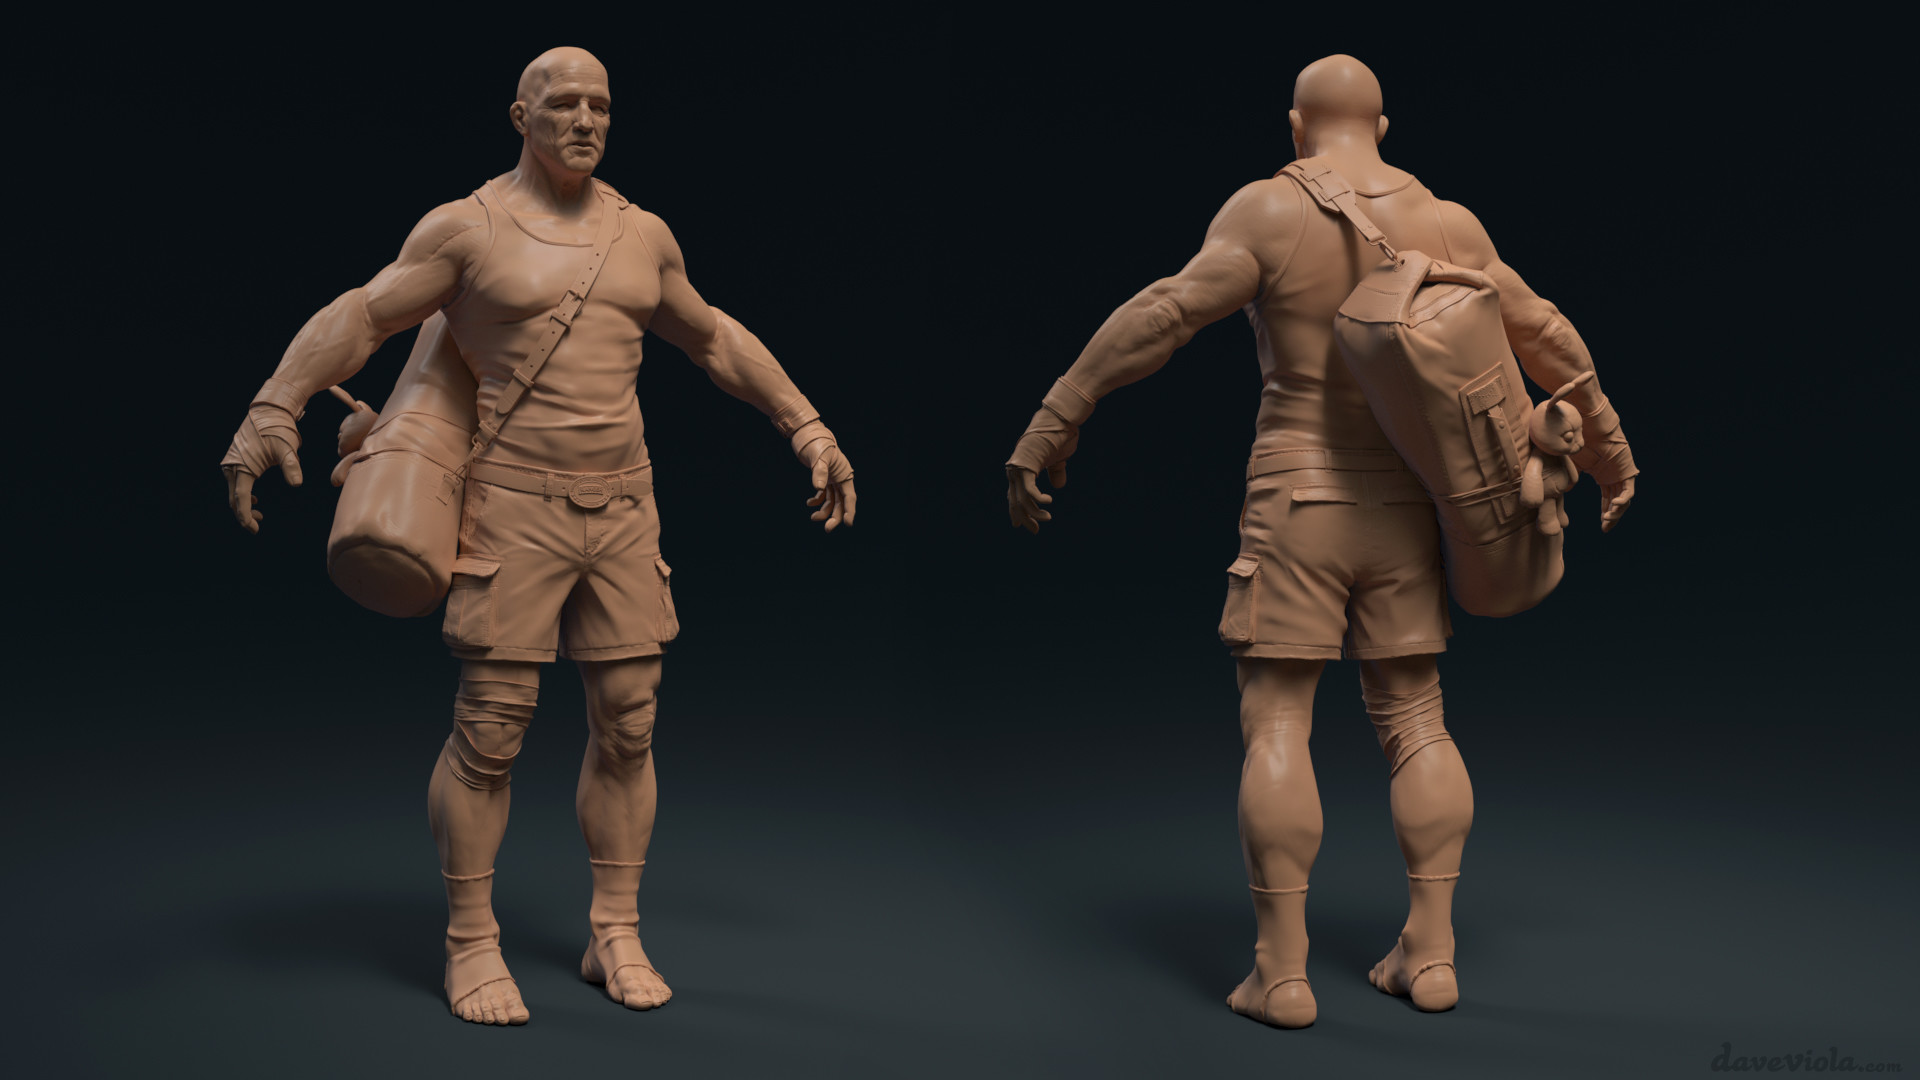 Dave viola fighter sculpt clothes render